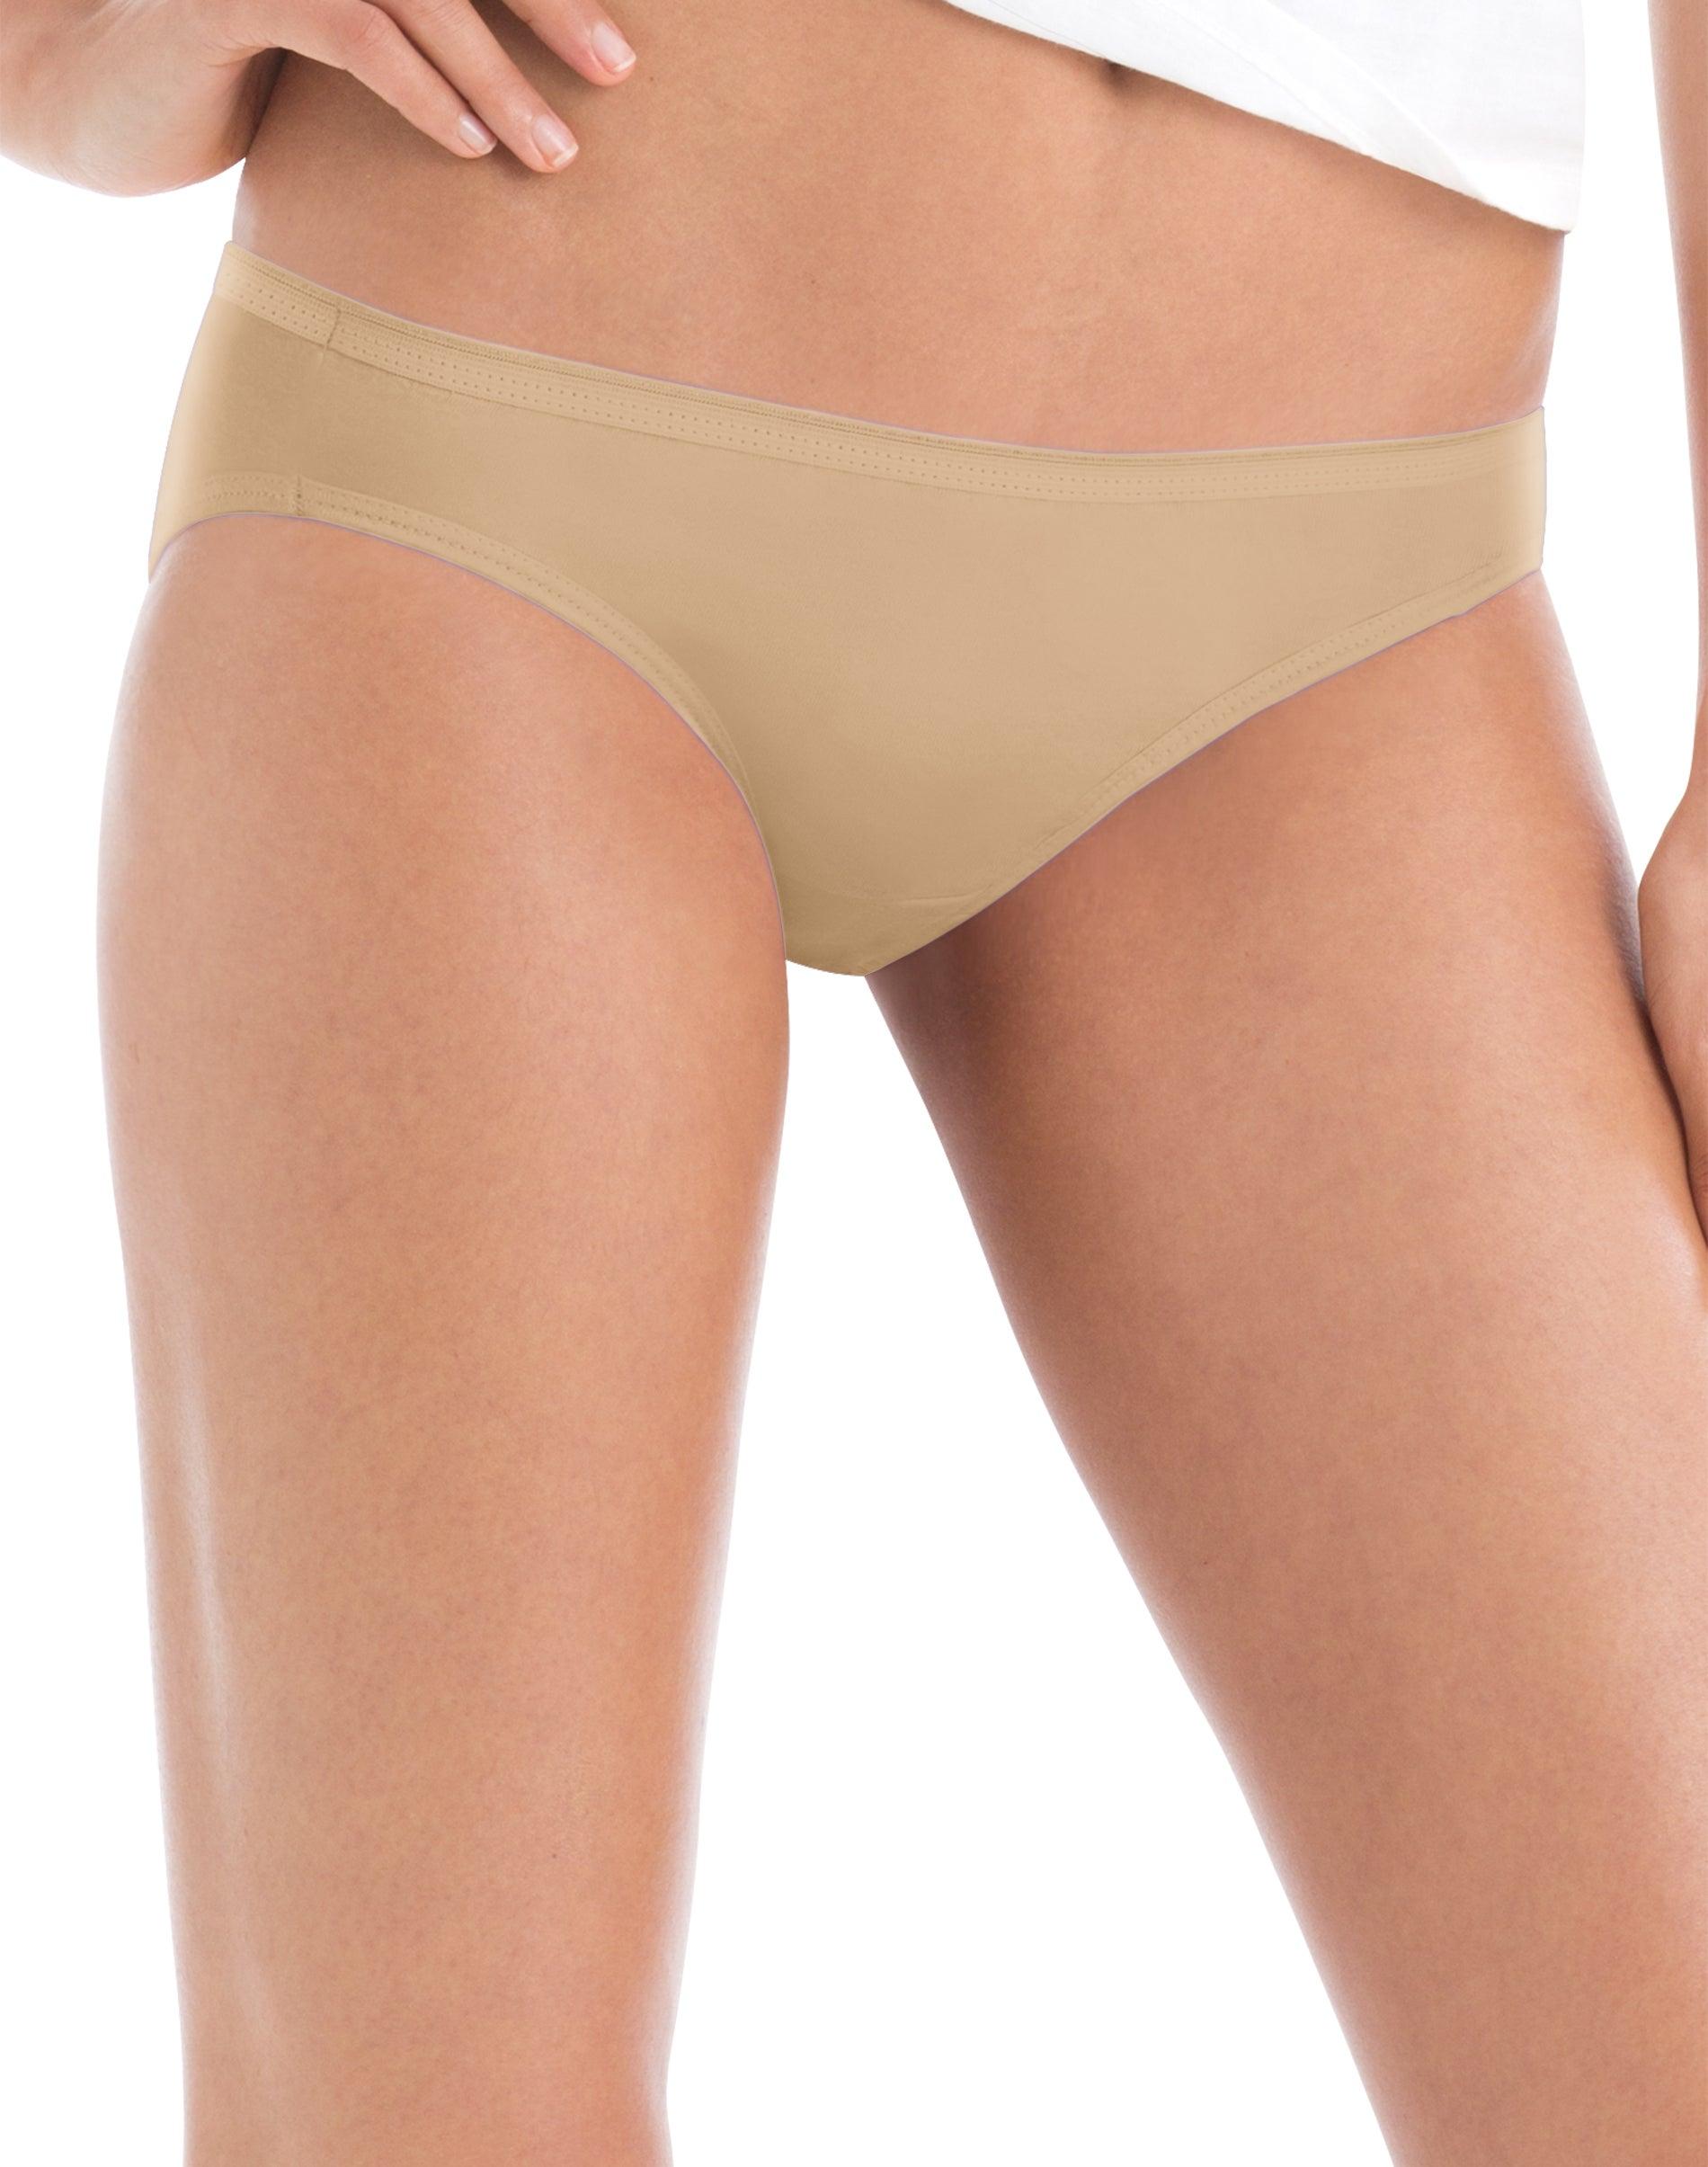 Hanes Womens Cool Comfort™ Cotton Tagless Bikinis Size 8 XL 8-Pair New